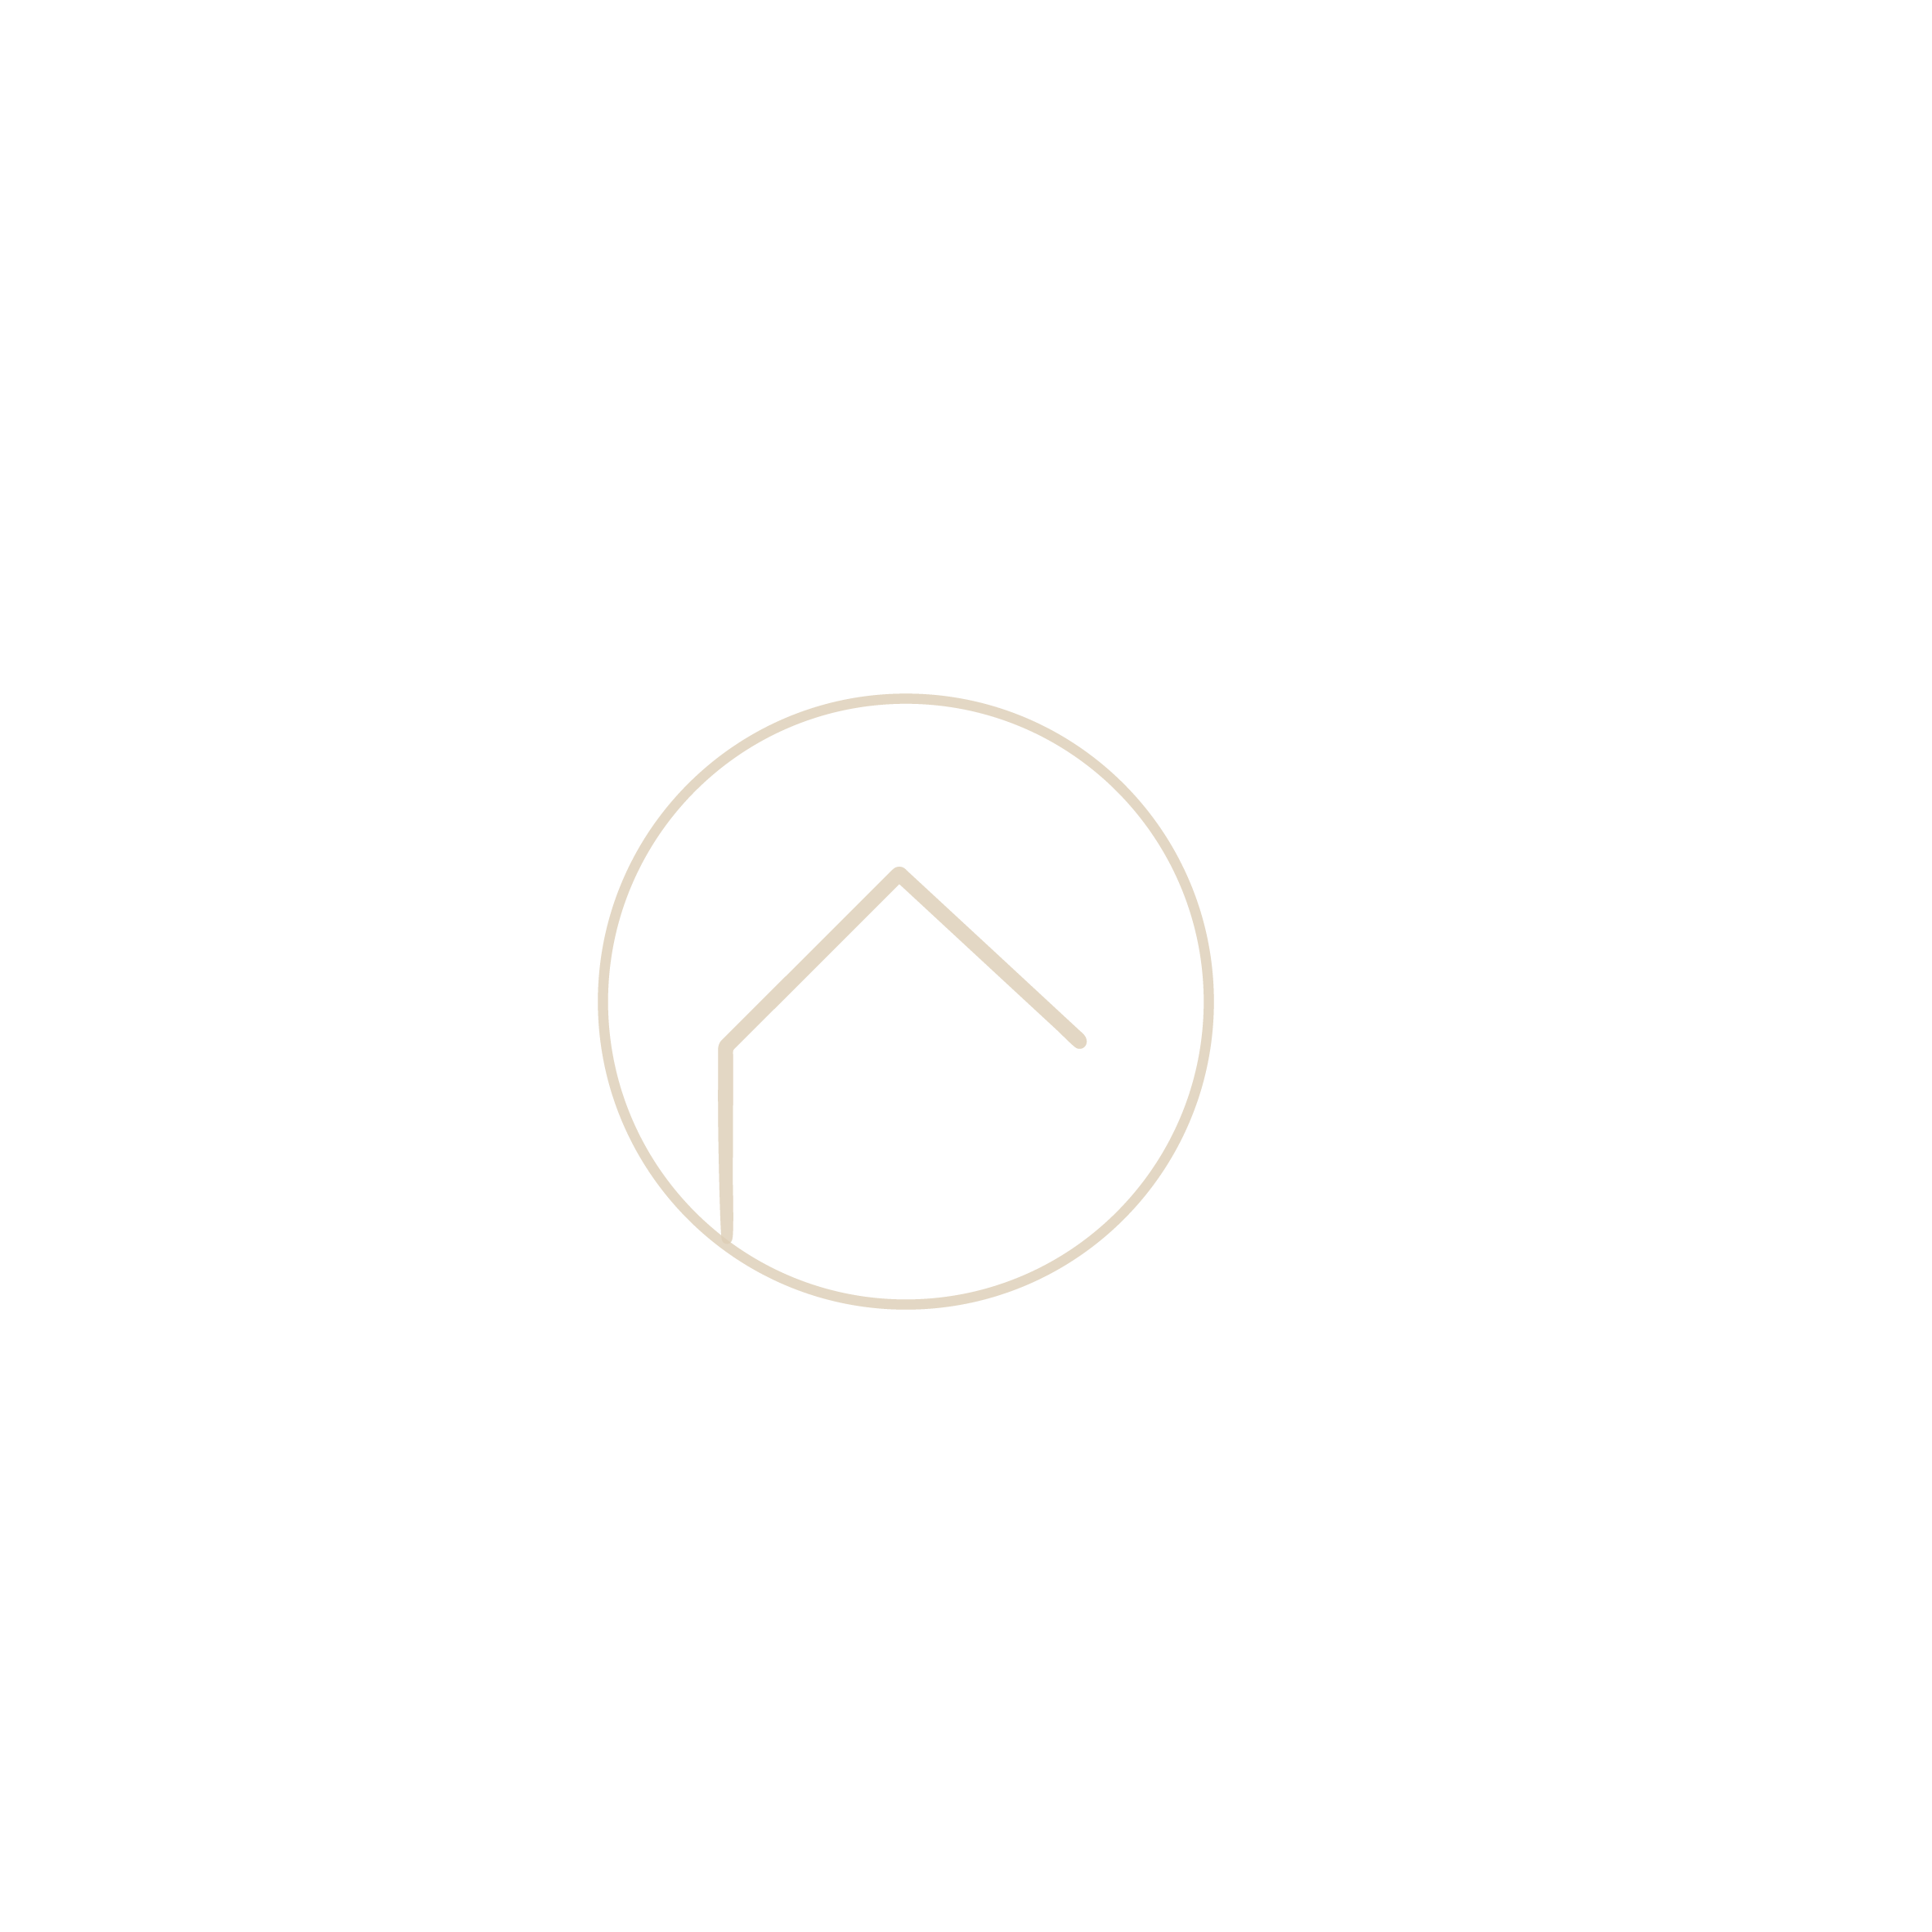 icoon huis house of progress